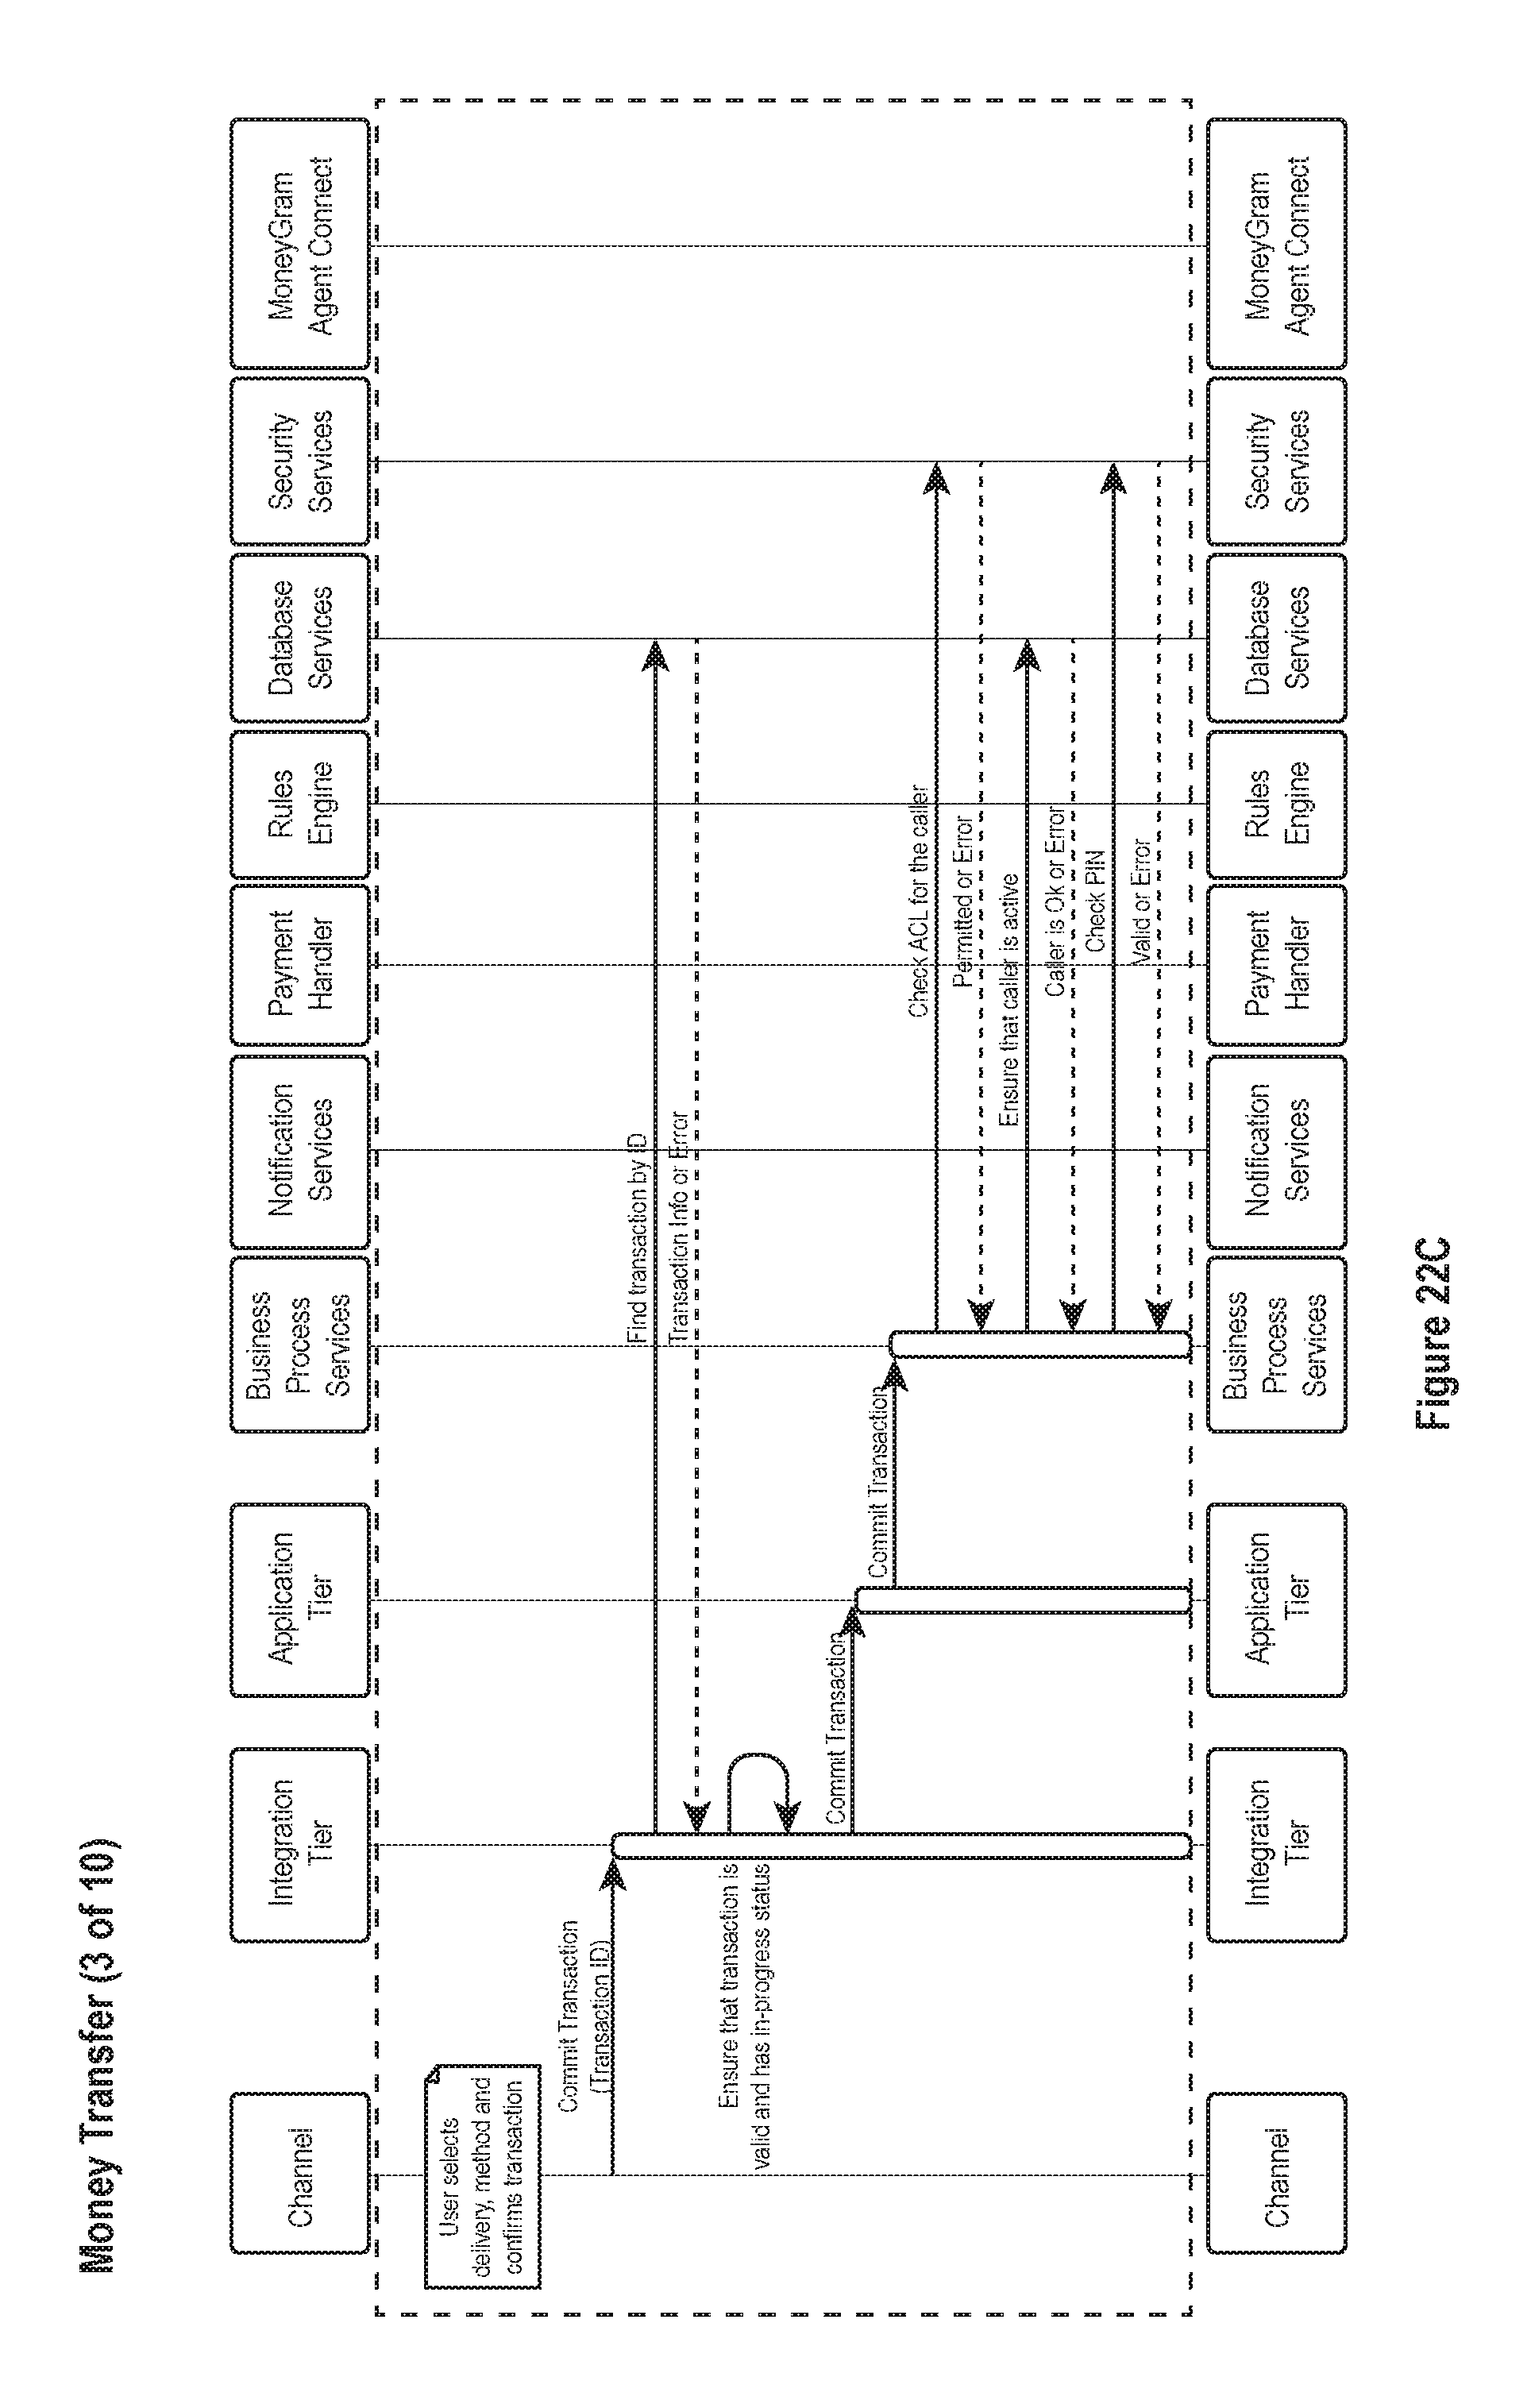 Patent US 9,892,386 B2